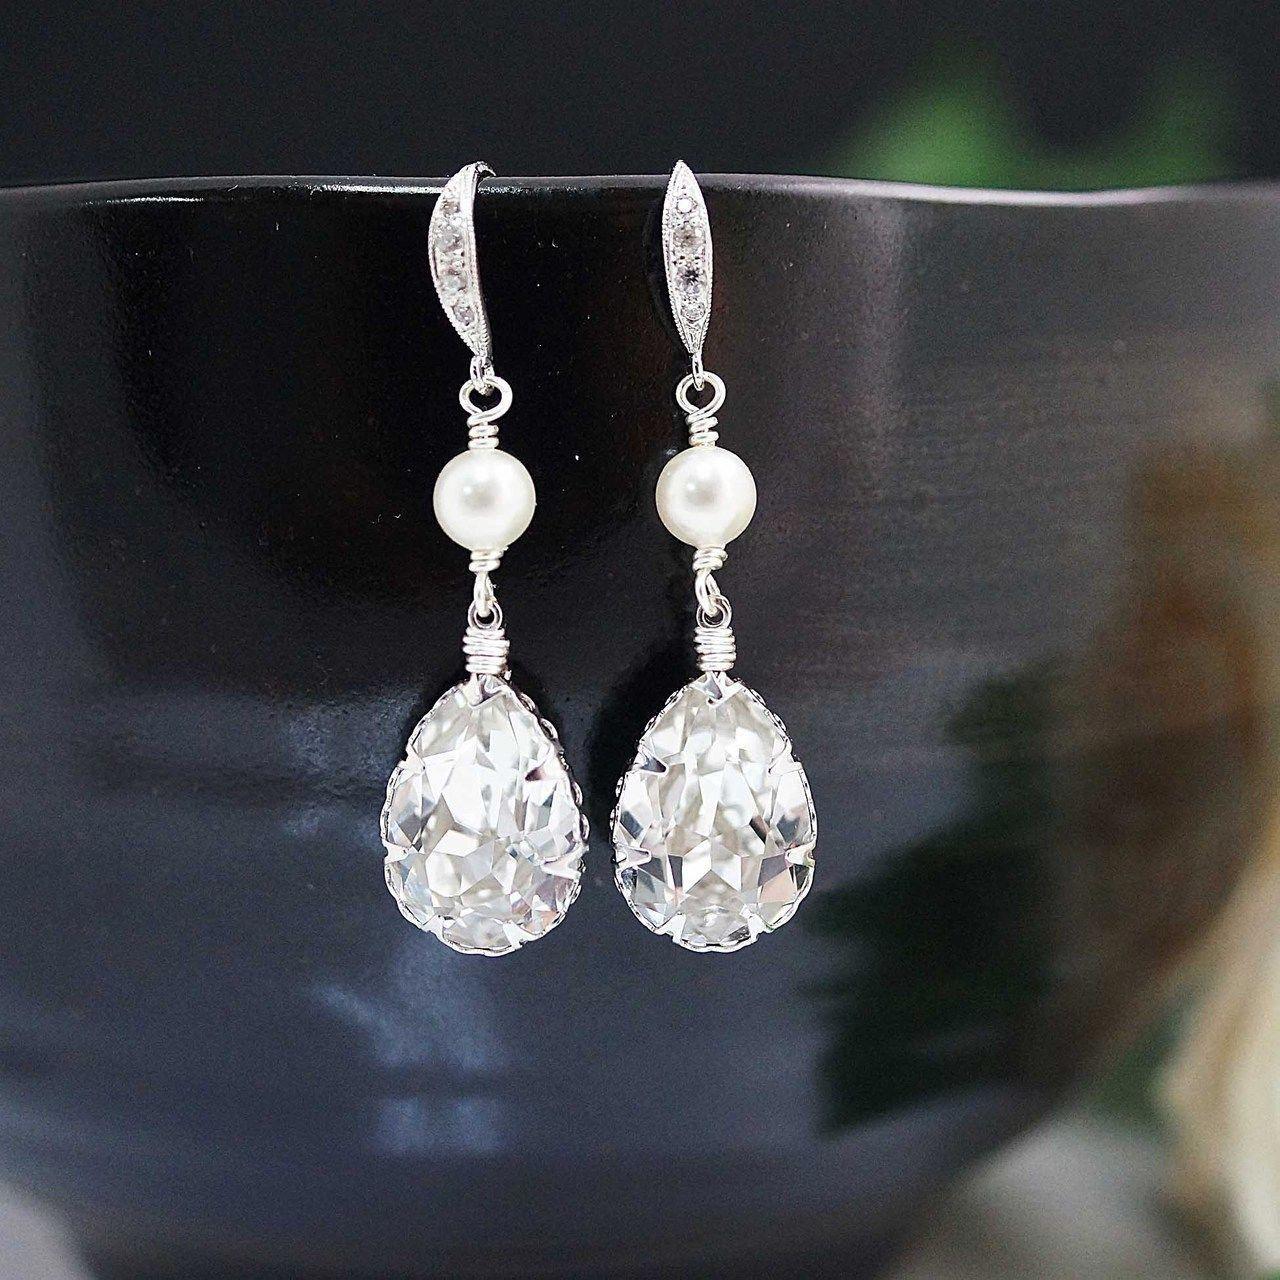 3495f1081 Swarovski crystal with pearl Bridal Earrings - Earrings Nation  #bridaljewelrywearmorethanonce